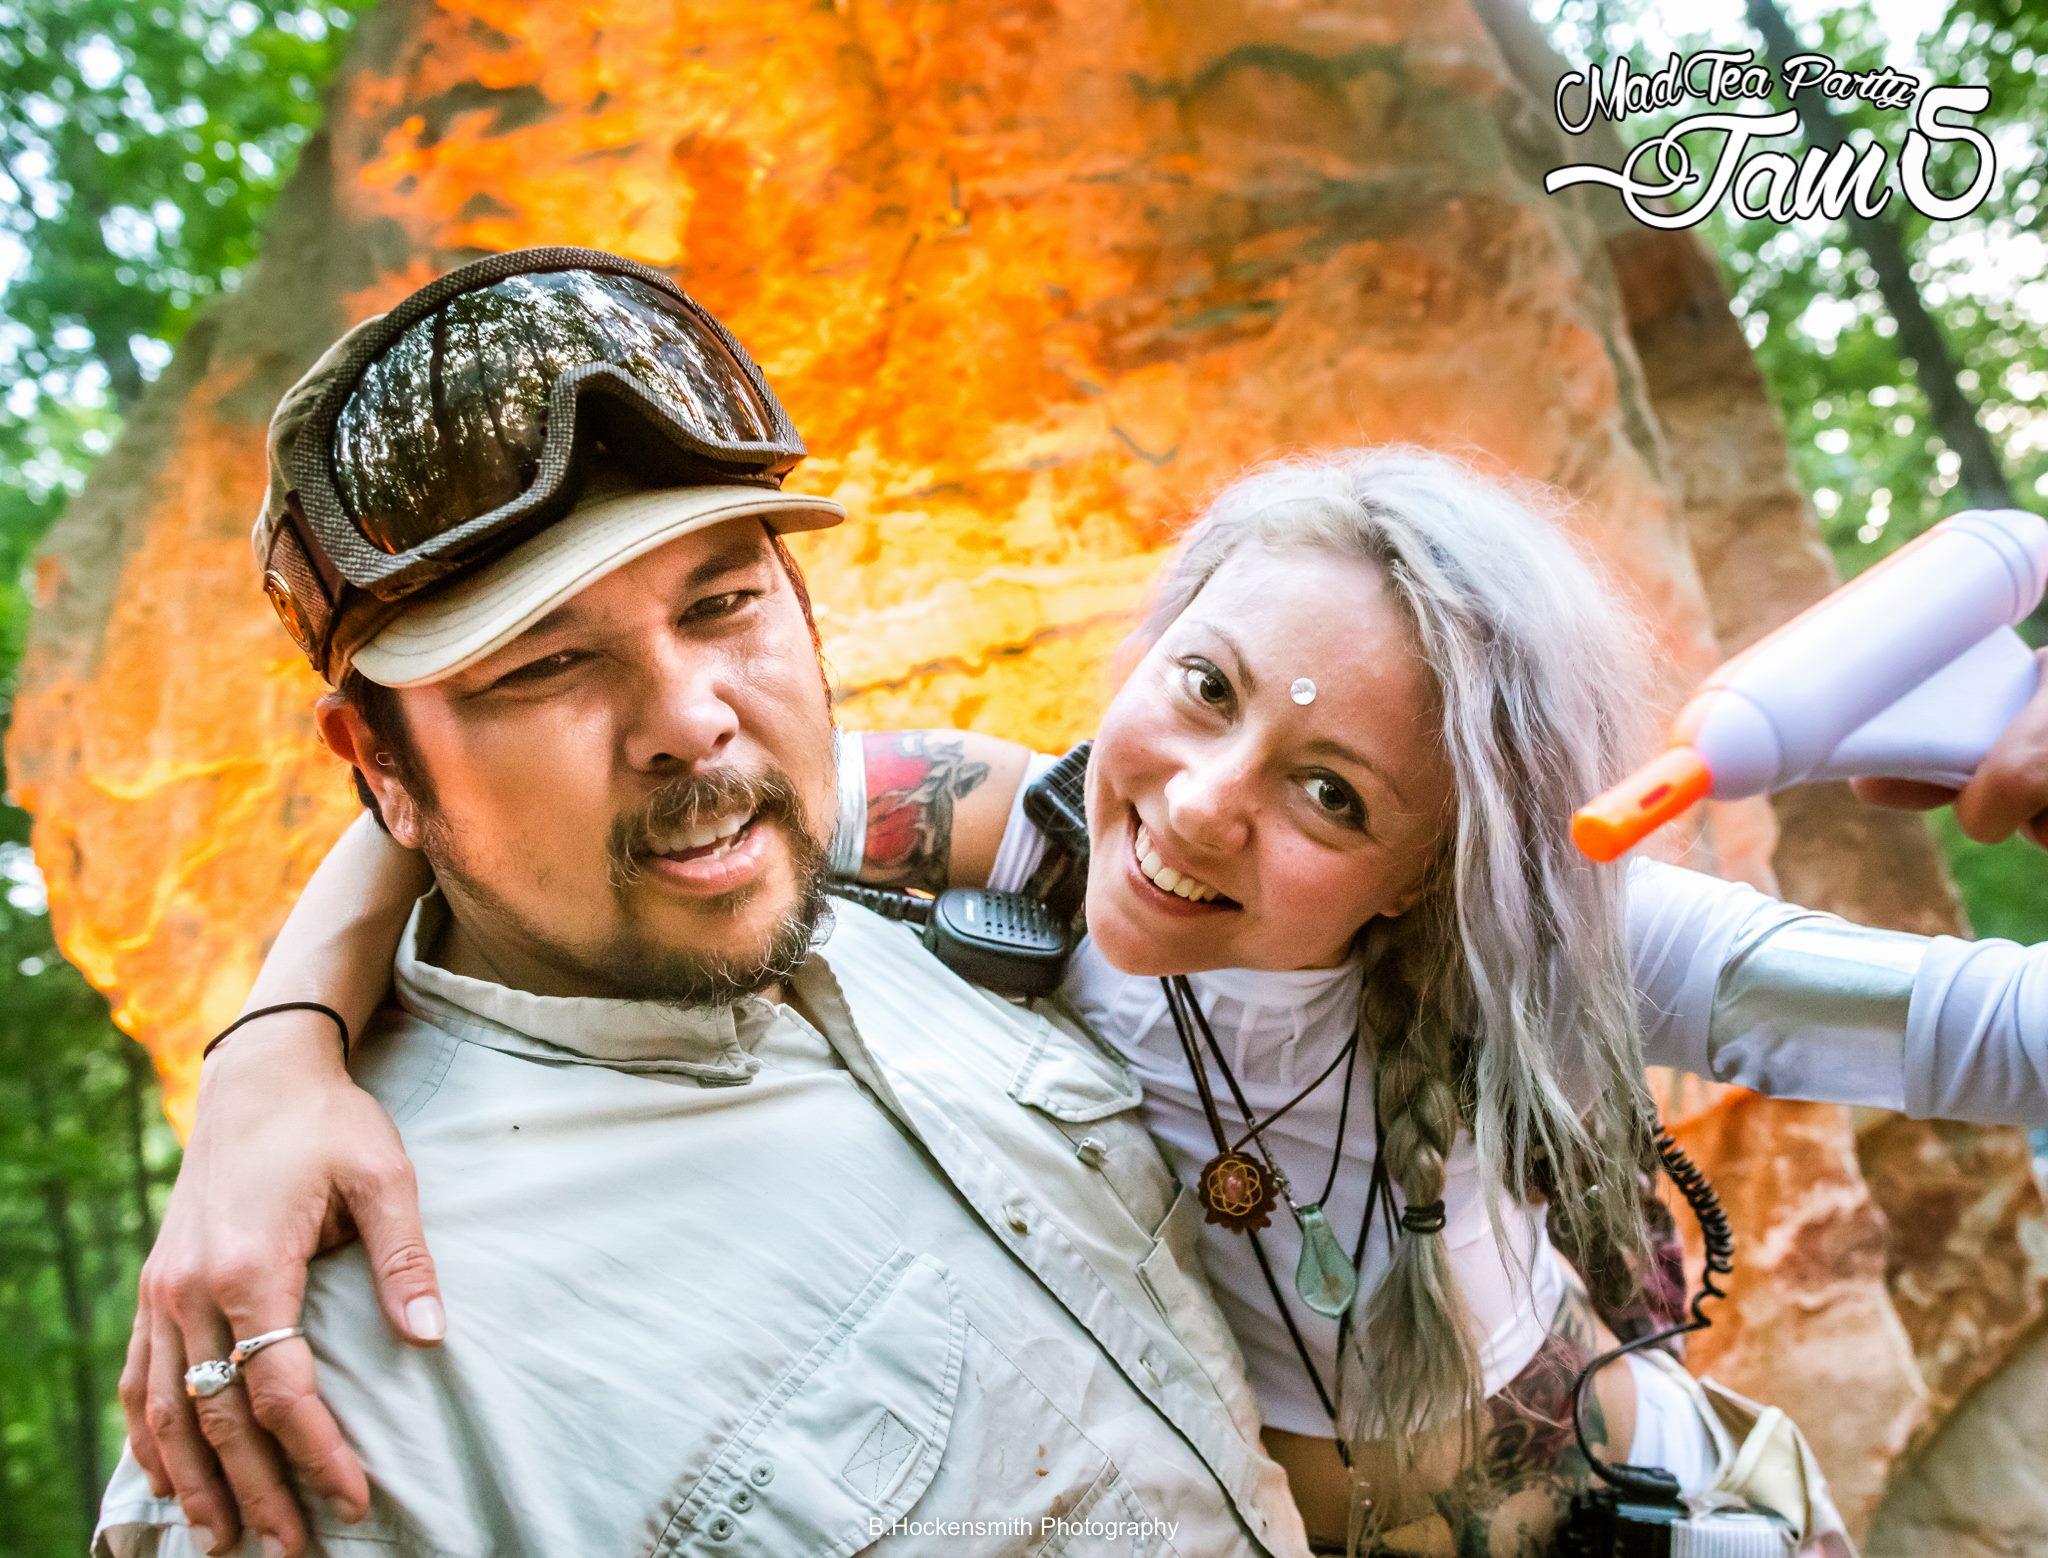 Taco & Elise Olmstead @ Mad Tea Party Jam 5 - Photo by Brian Hockensmith ( B. Hockensmith Photography )